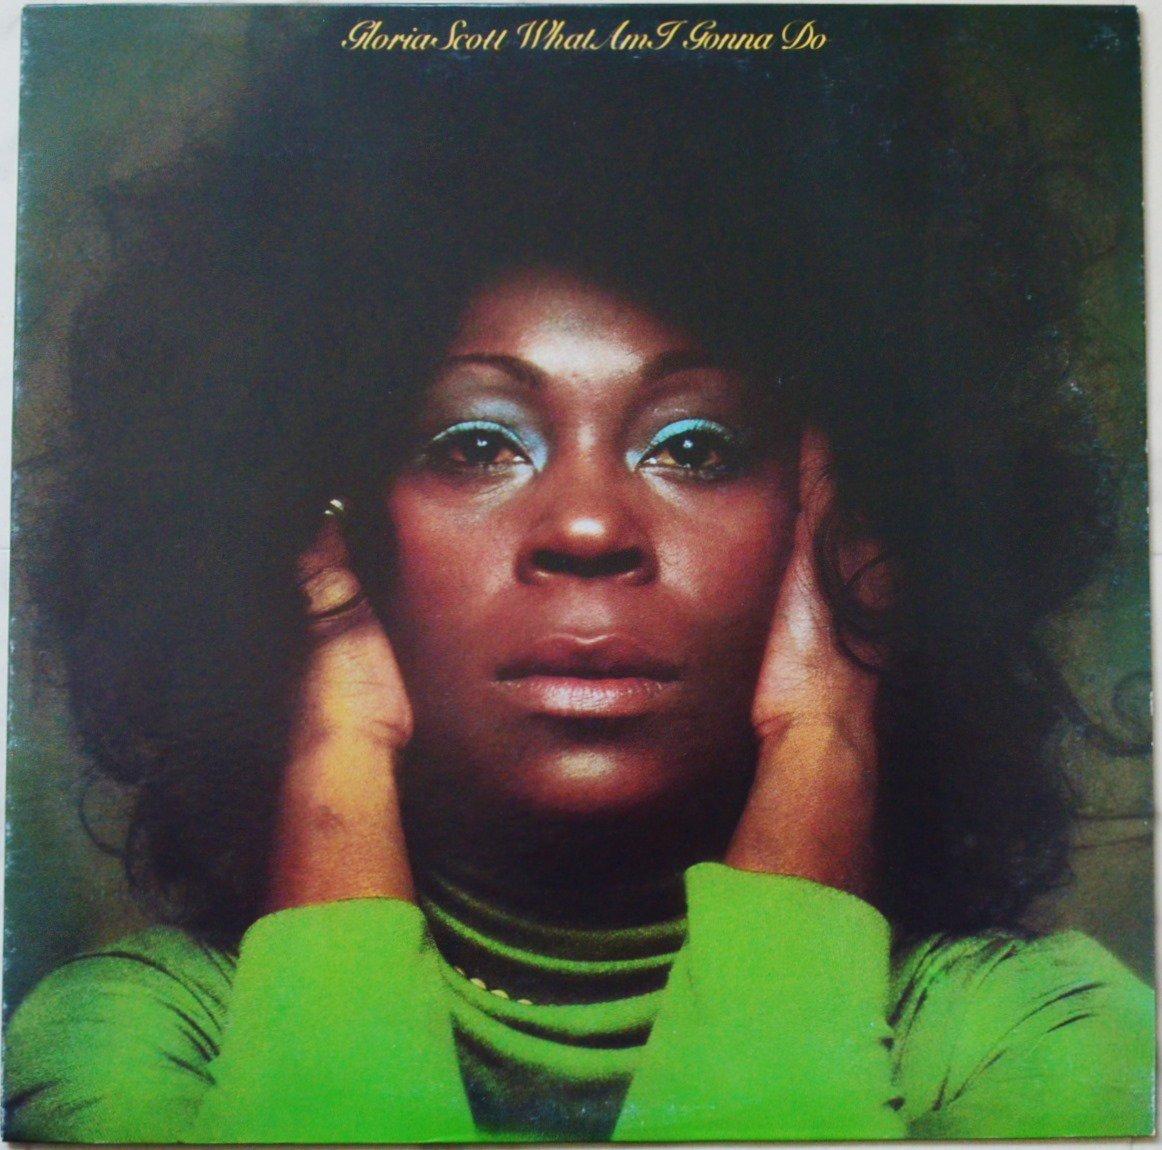 GLORIA SCOTT / WHAT AM I GONNA DO (LP)